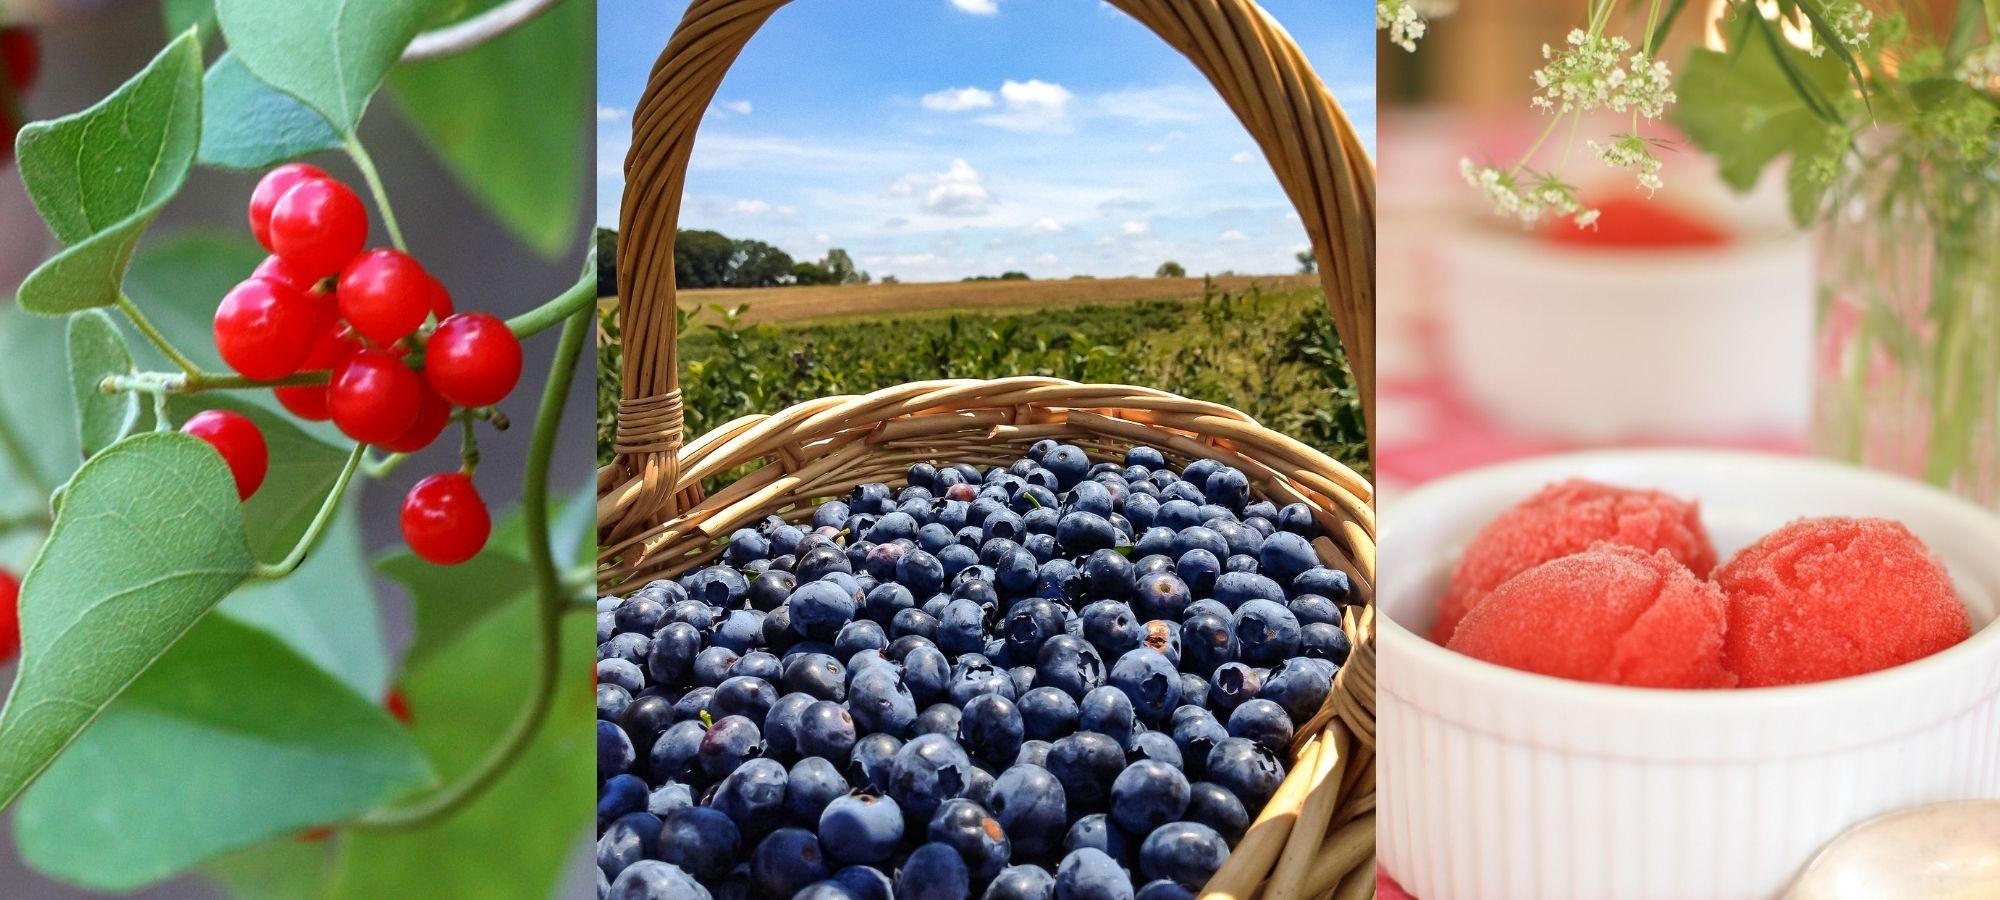 A basket filled with freshly picked blueberries at O'Bio Self Harvesting Garden in West Flanders, Belgium